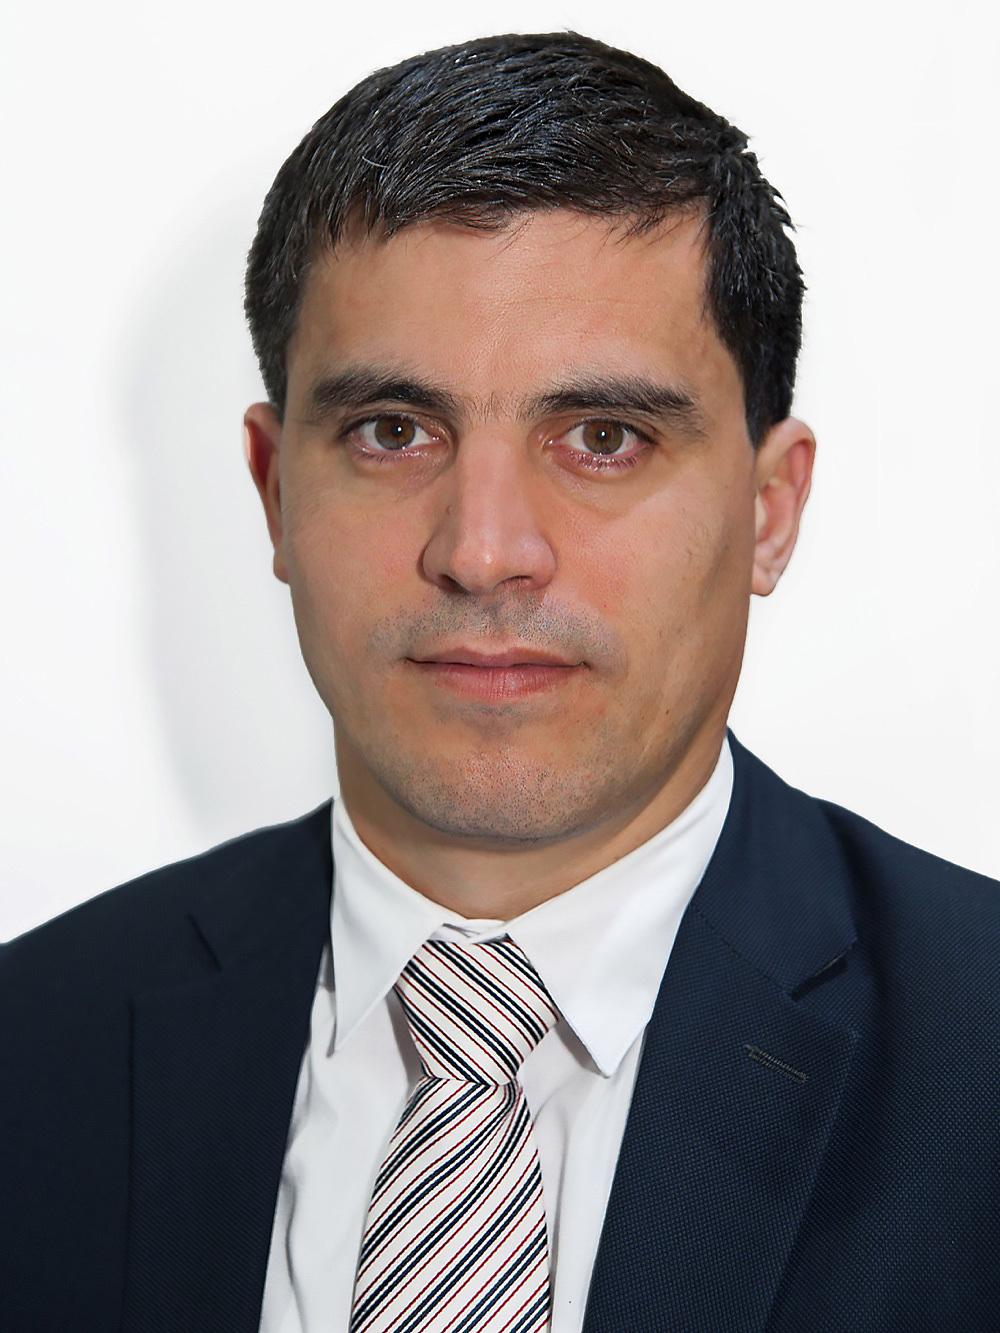 vf-Sergio-Mazzoni-Director-de-ventas-de-la-division-Extended-Access-Technology-HID-Global-para-America-Latina